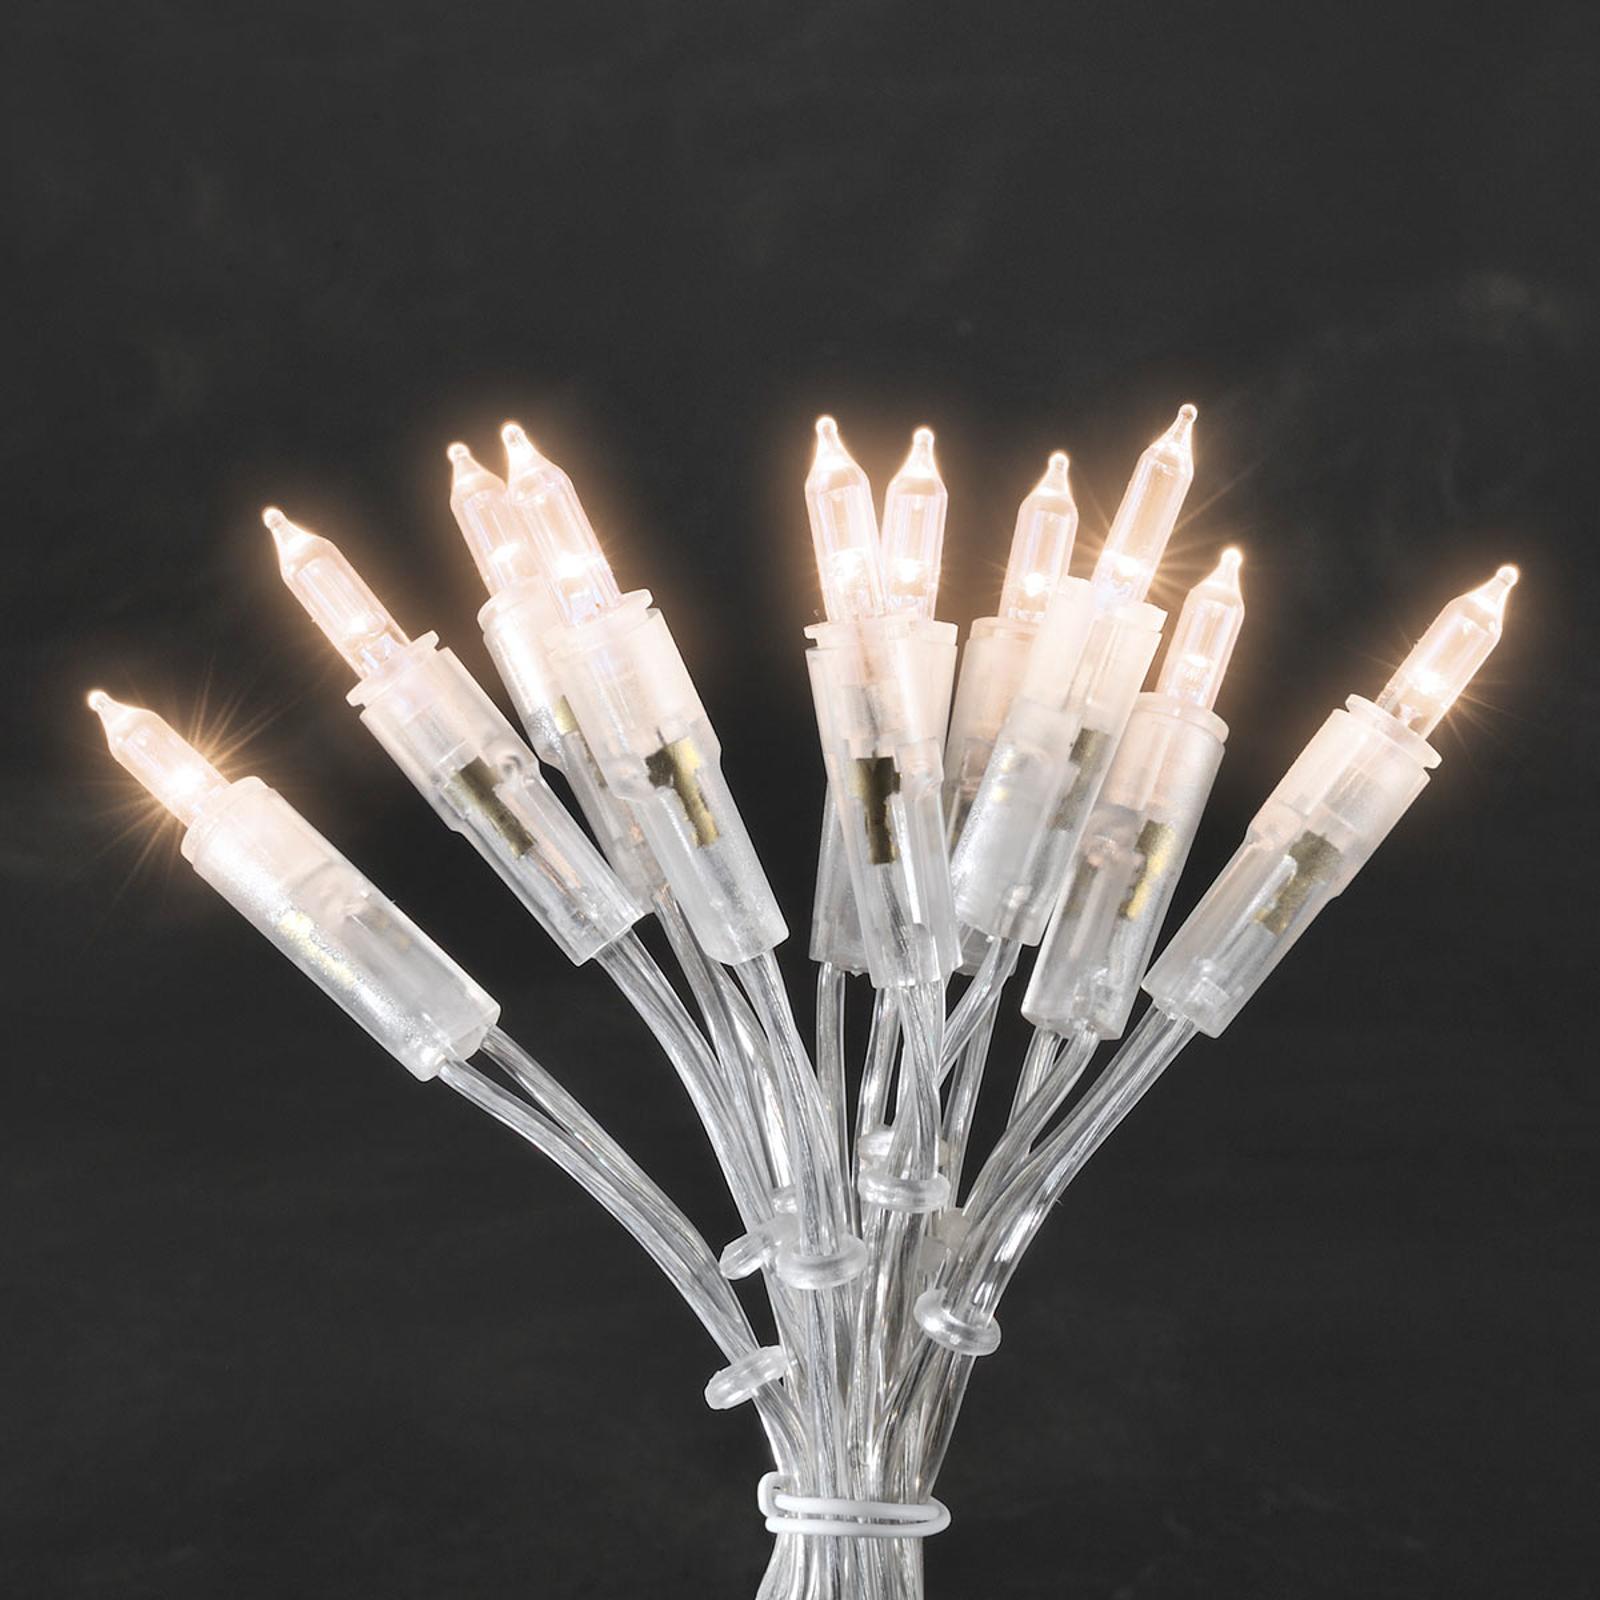 Ghirlanda luminosa con 20 micro LED, bianco caldo